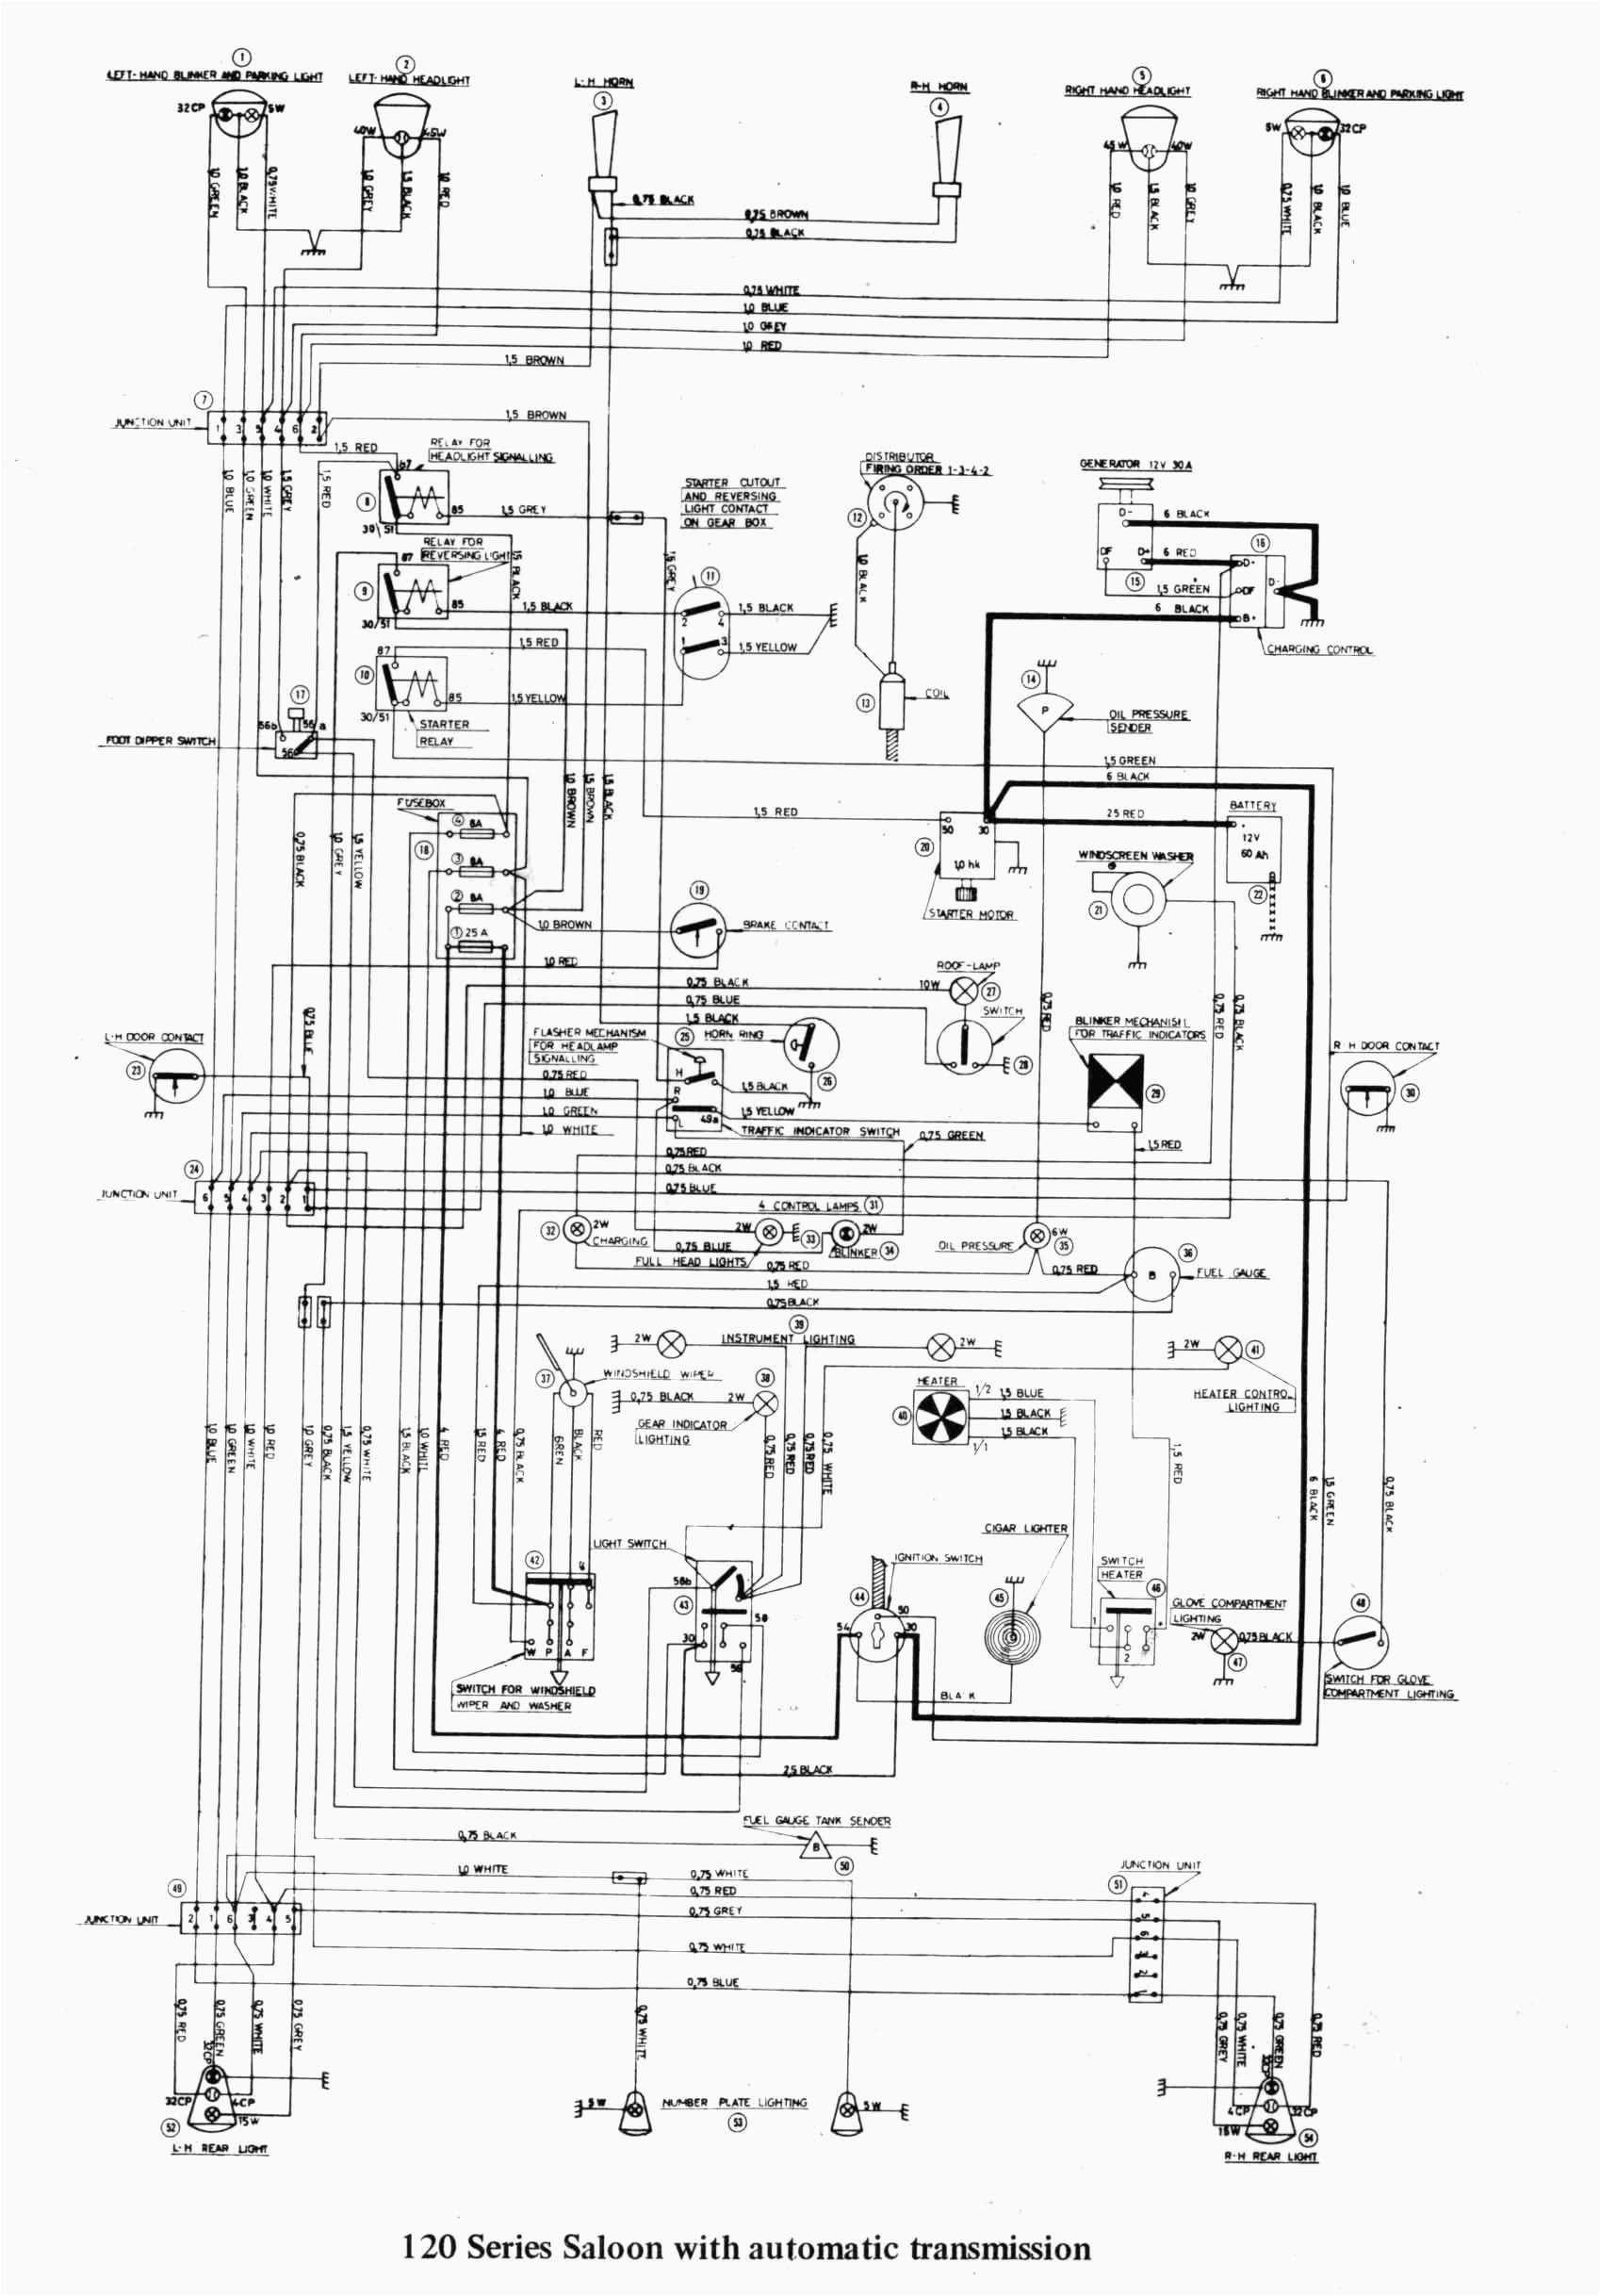 2000 Honda Accord Wiring Diagram Auto Zone Wiring Diagrams Schematics Wiring Diagram Of 2000 Honda Accord Wiring Diagram